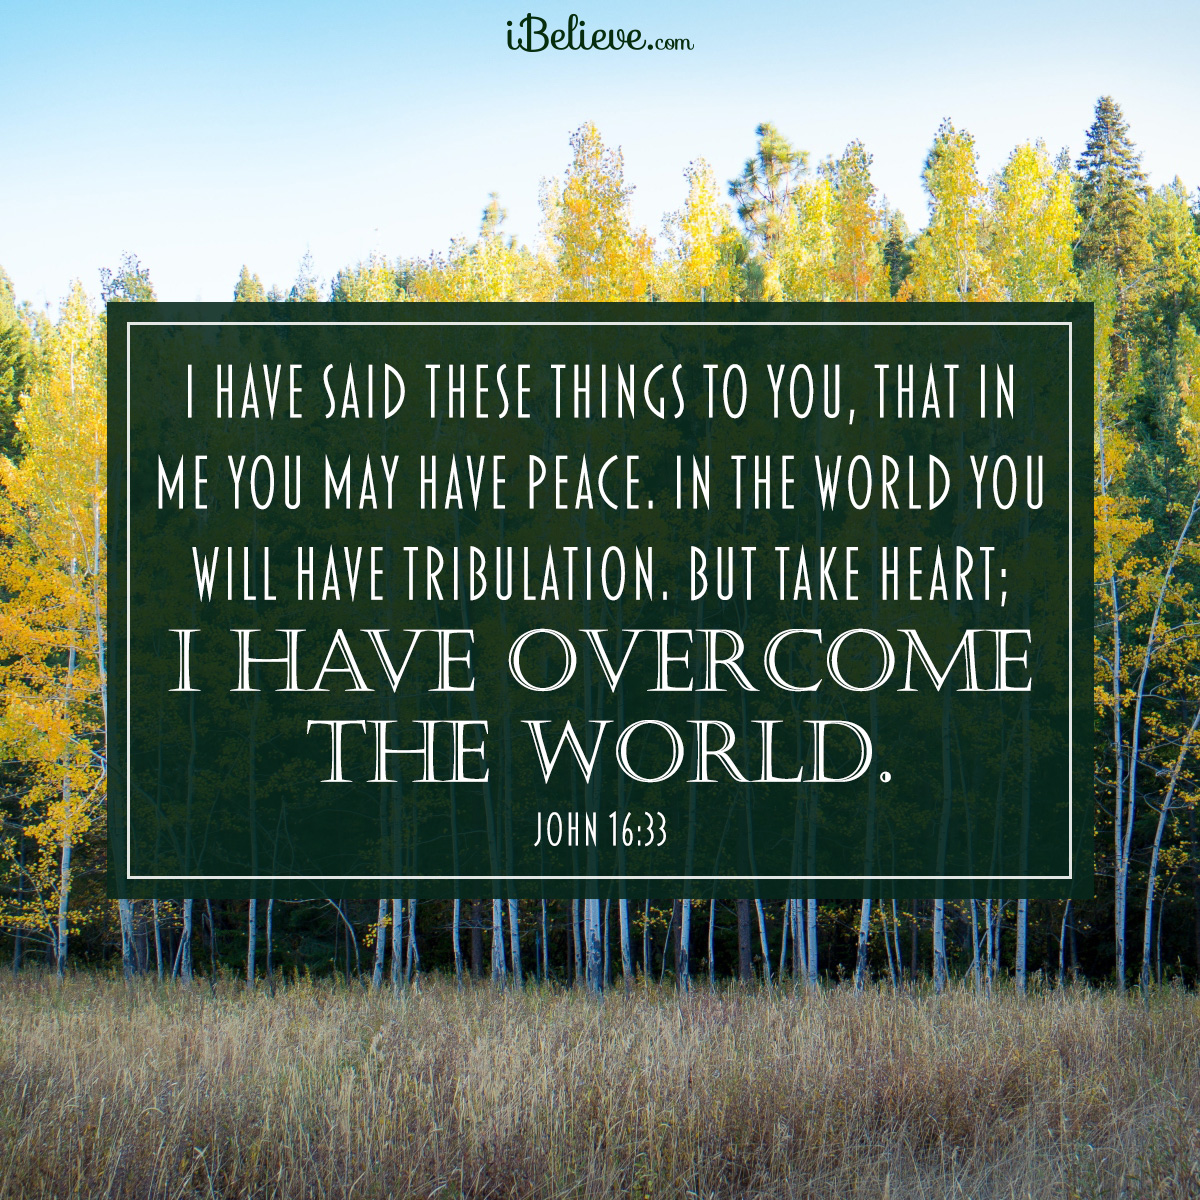 John 16:33, inspirational image